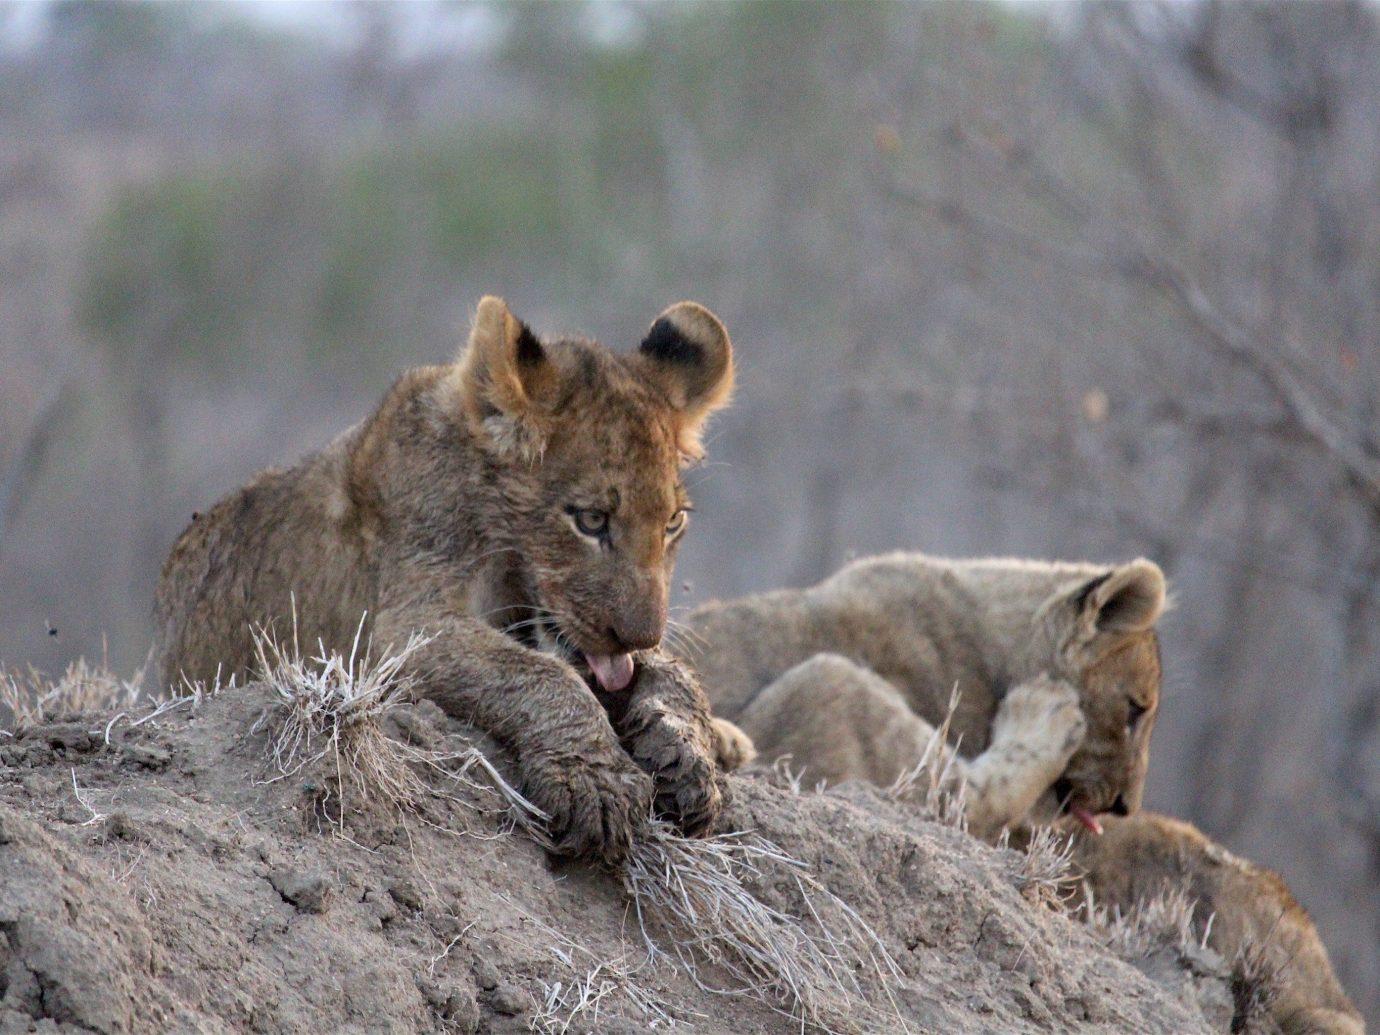 Outdoors + Adventure Safaris Trip Ideas animal Lion big cat mammal outdoor Wildlife vertebrate fauna rock brown Safari